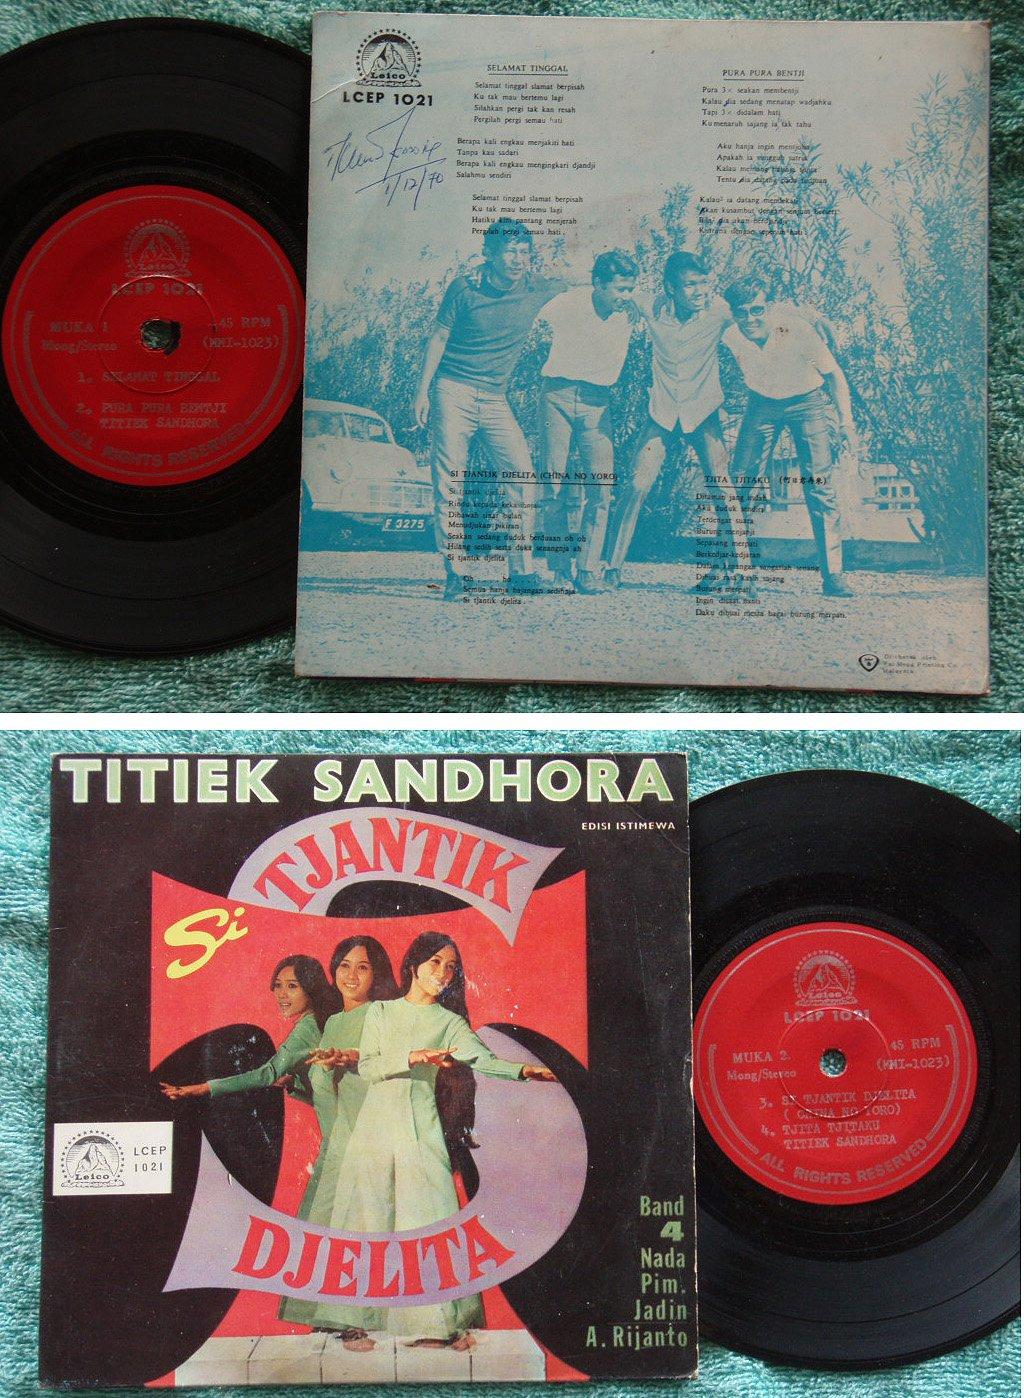 Indo TITIEK & Band 4 Nada Malay freak pop EP #1021 (592)